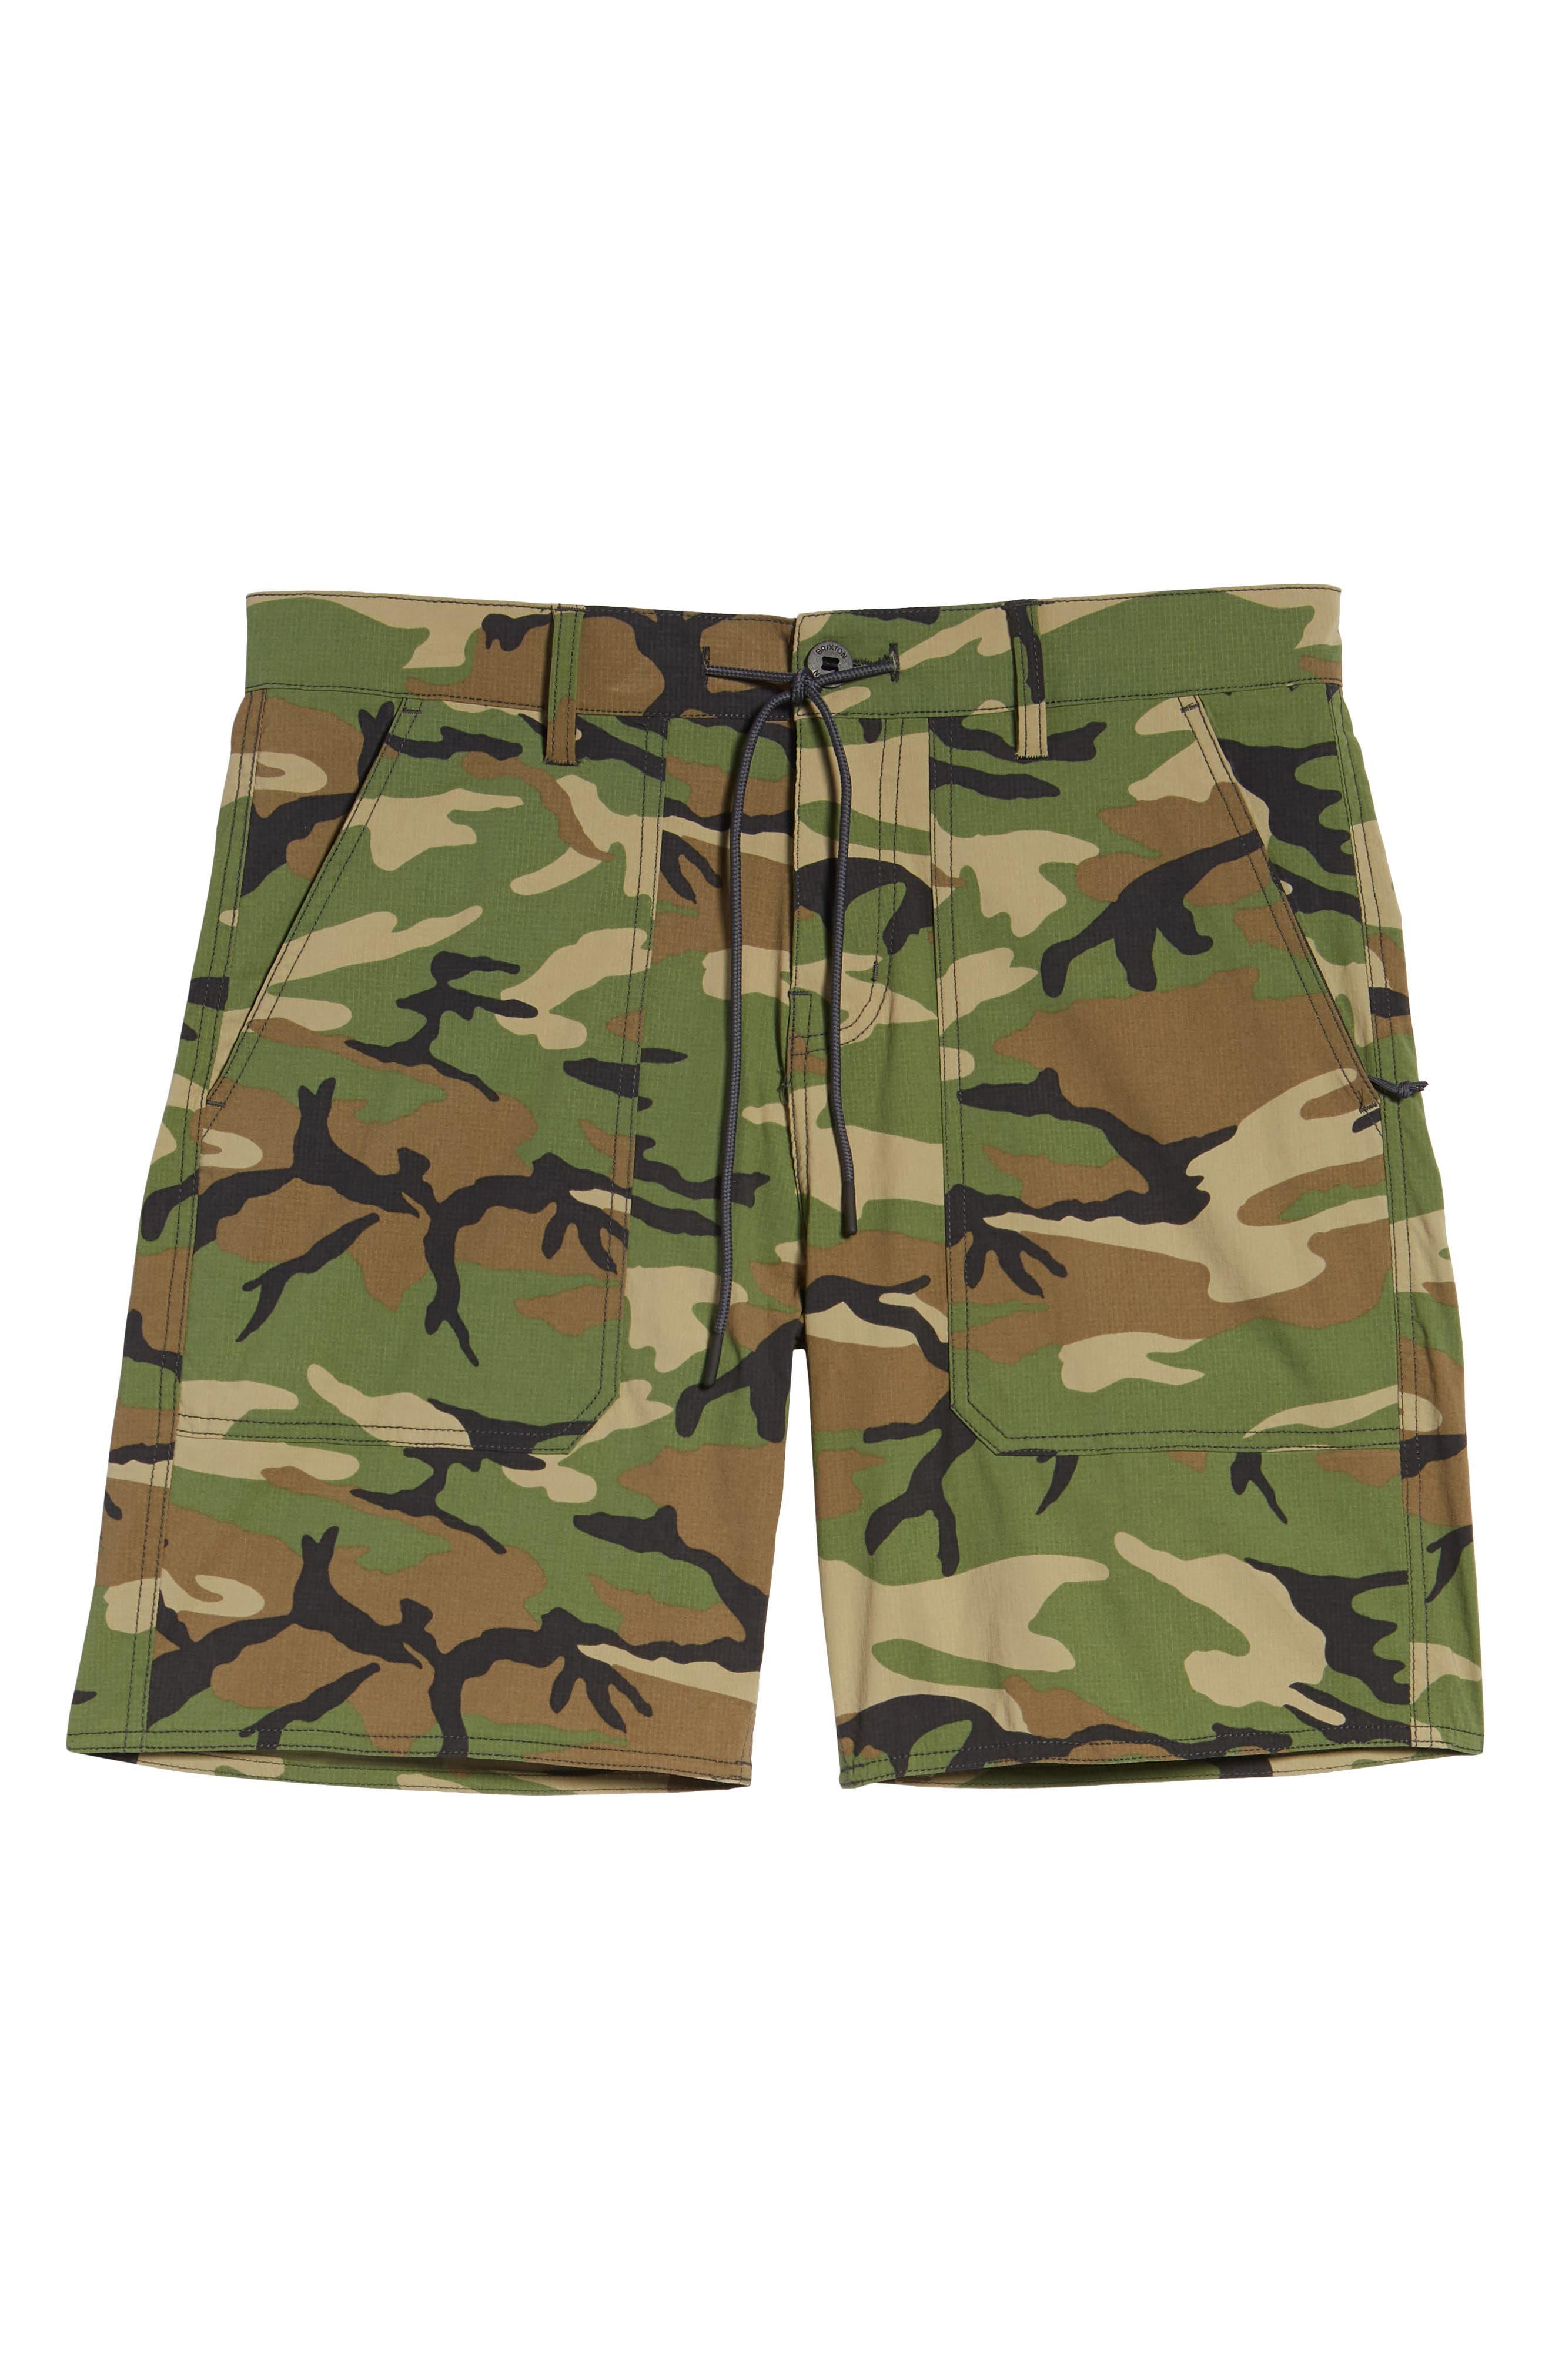 Prospect Service Shorts,                             Alternate thumbnail 6, color,                             Multi Camo